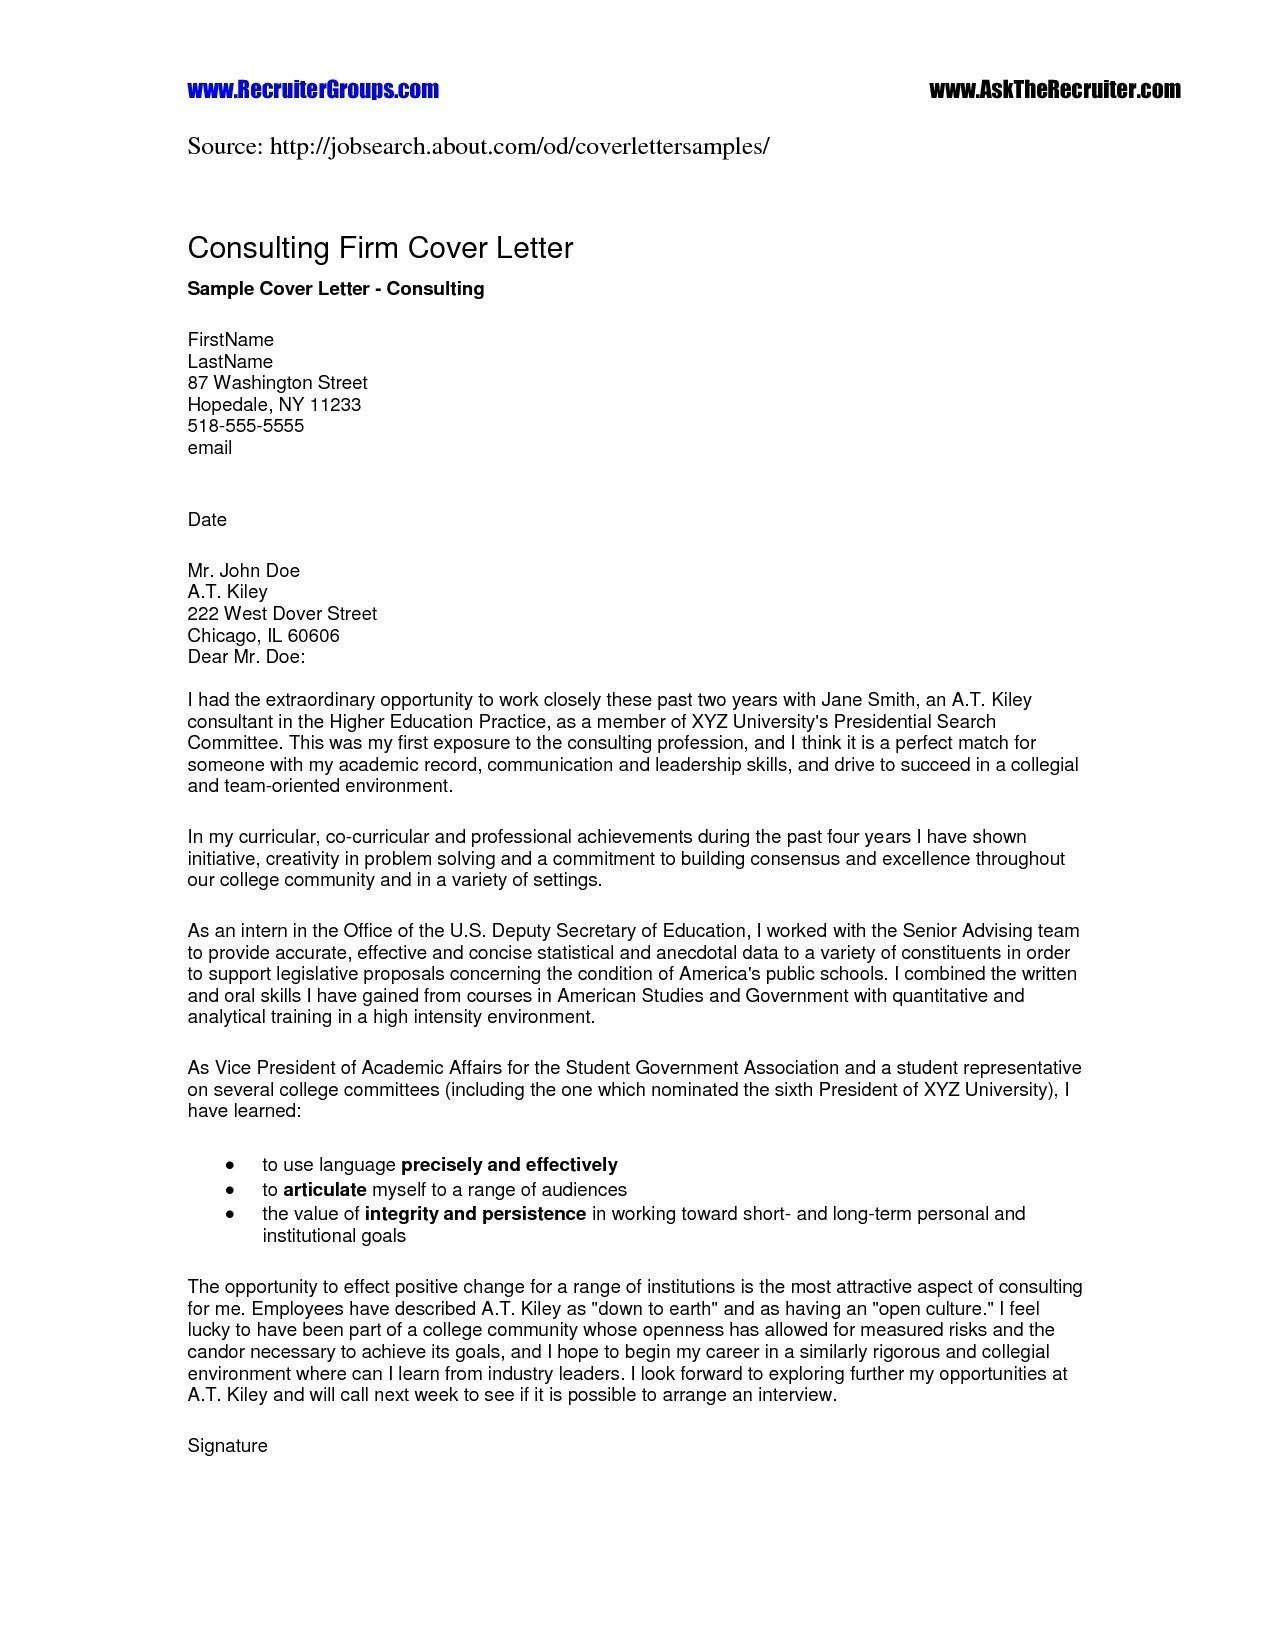 Employment Verification Letter Template - Sample Job Verification Letter Refrence Job Application Letter